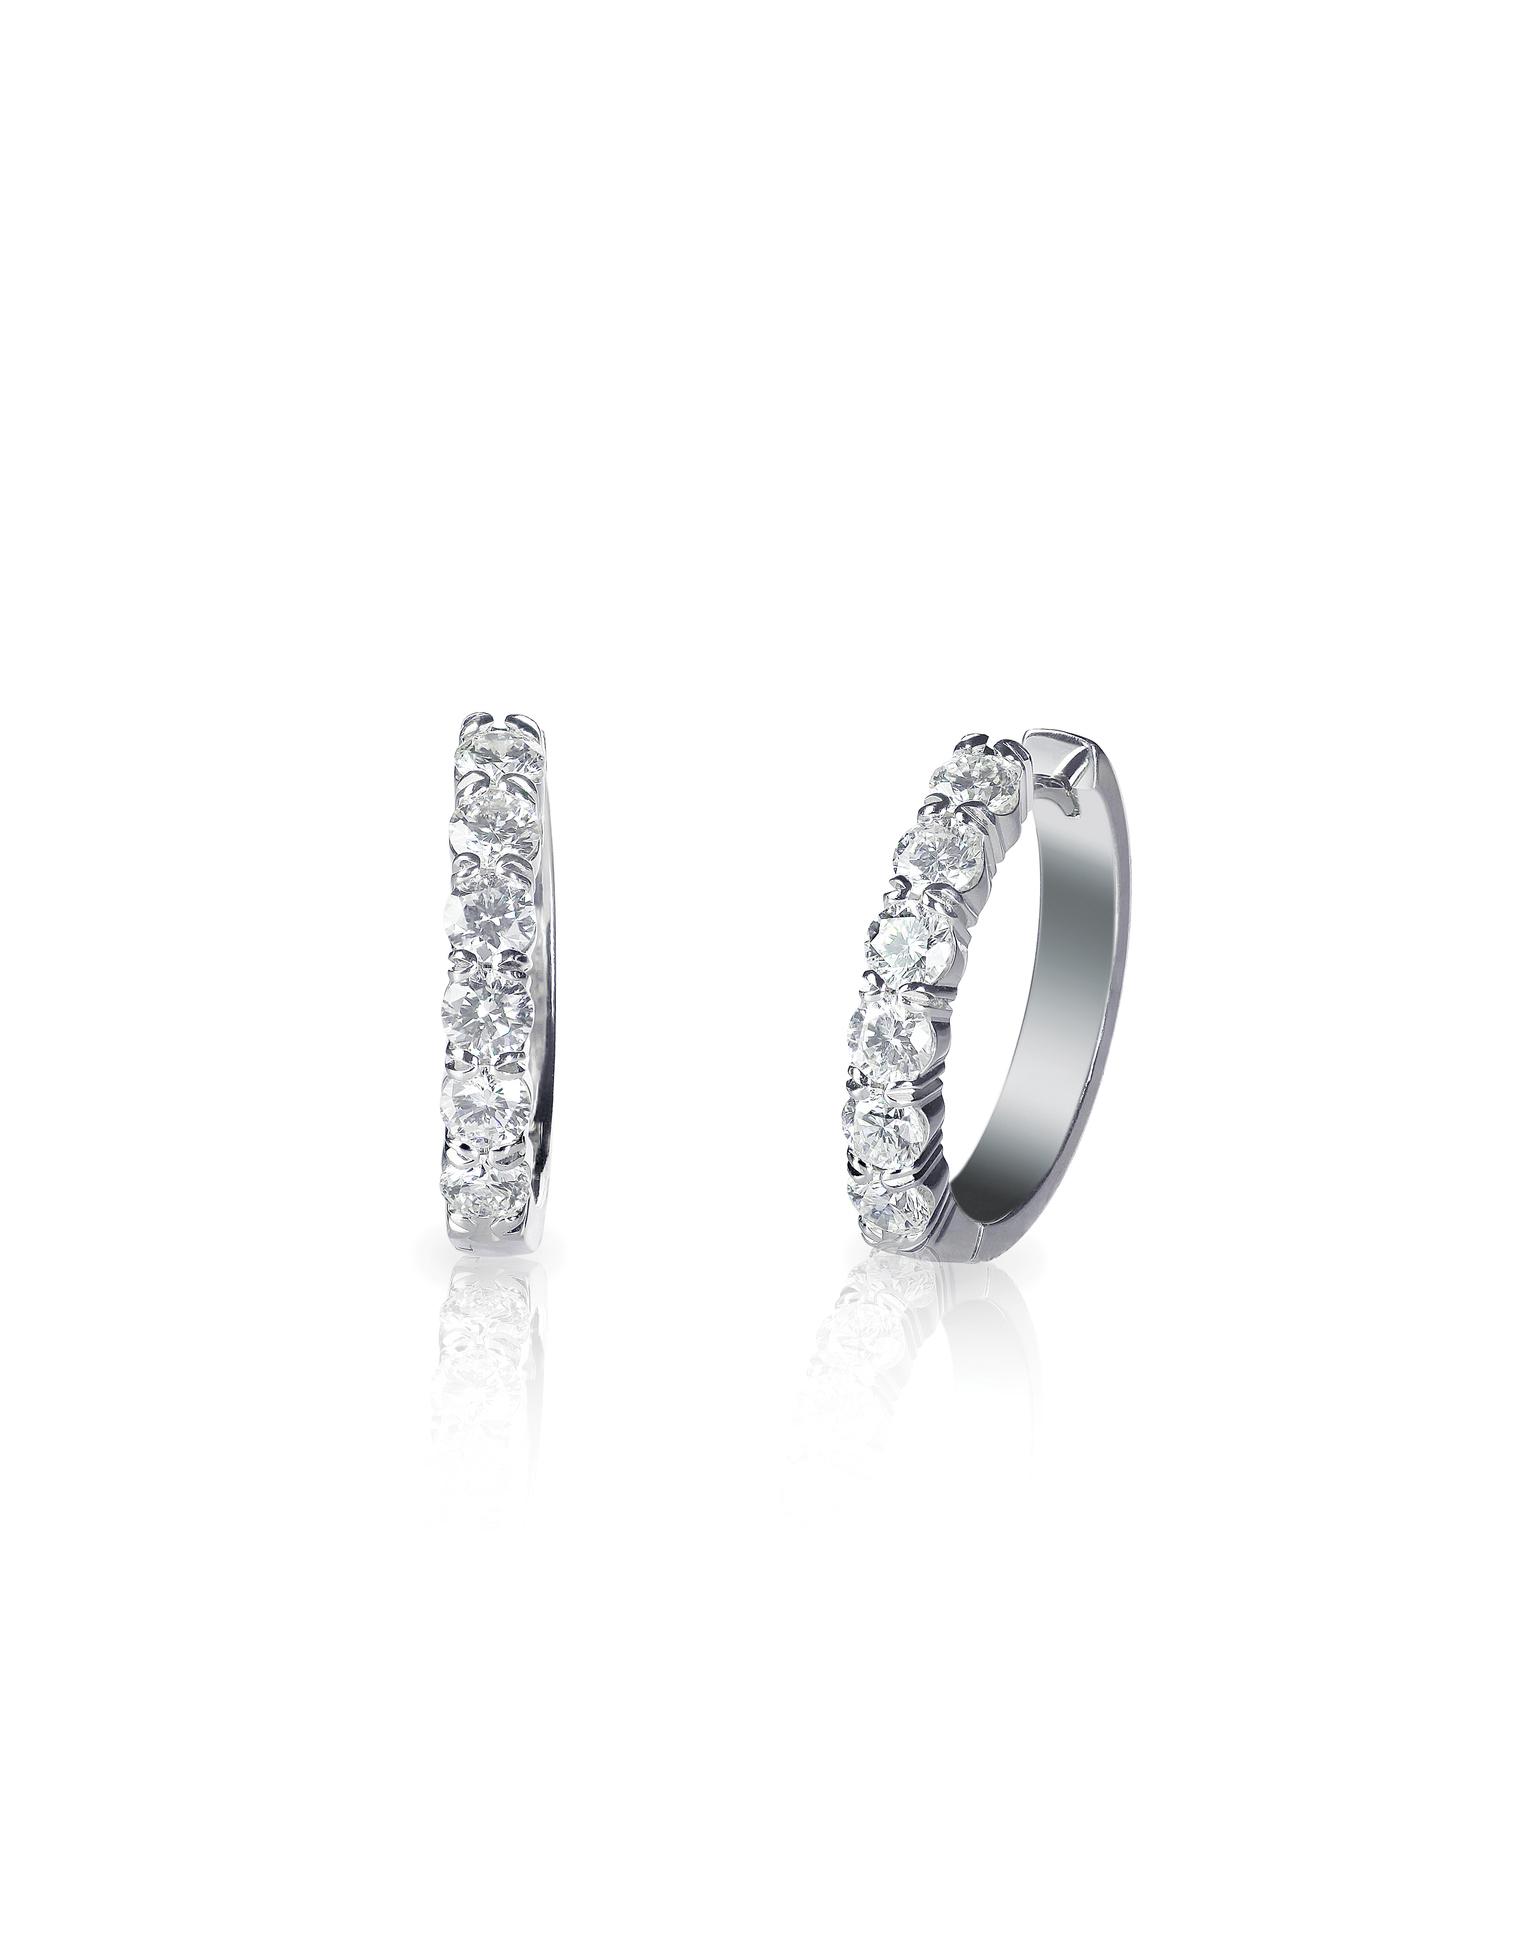 Platinum shared claw diamond hoop earrings